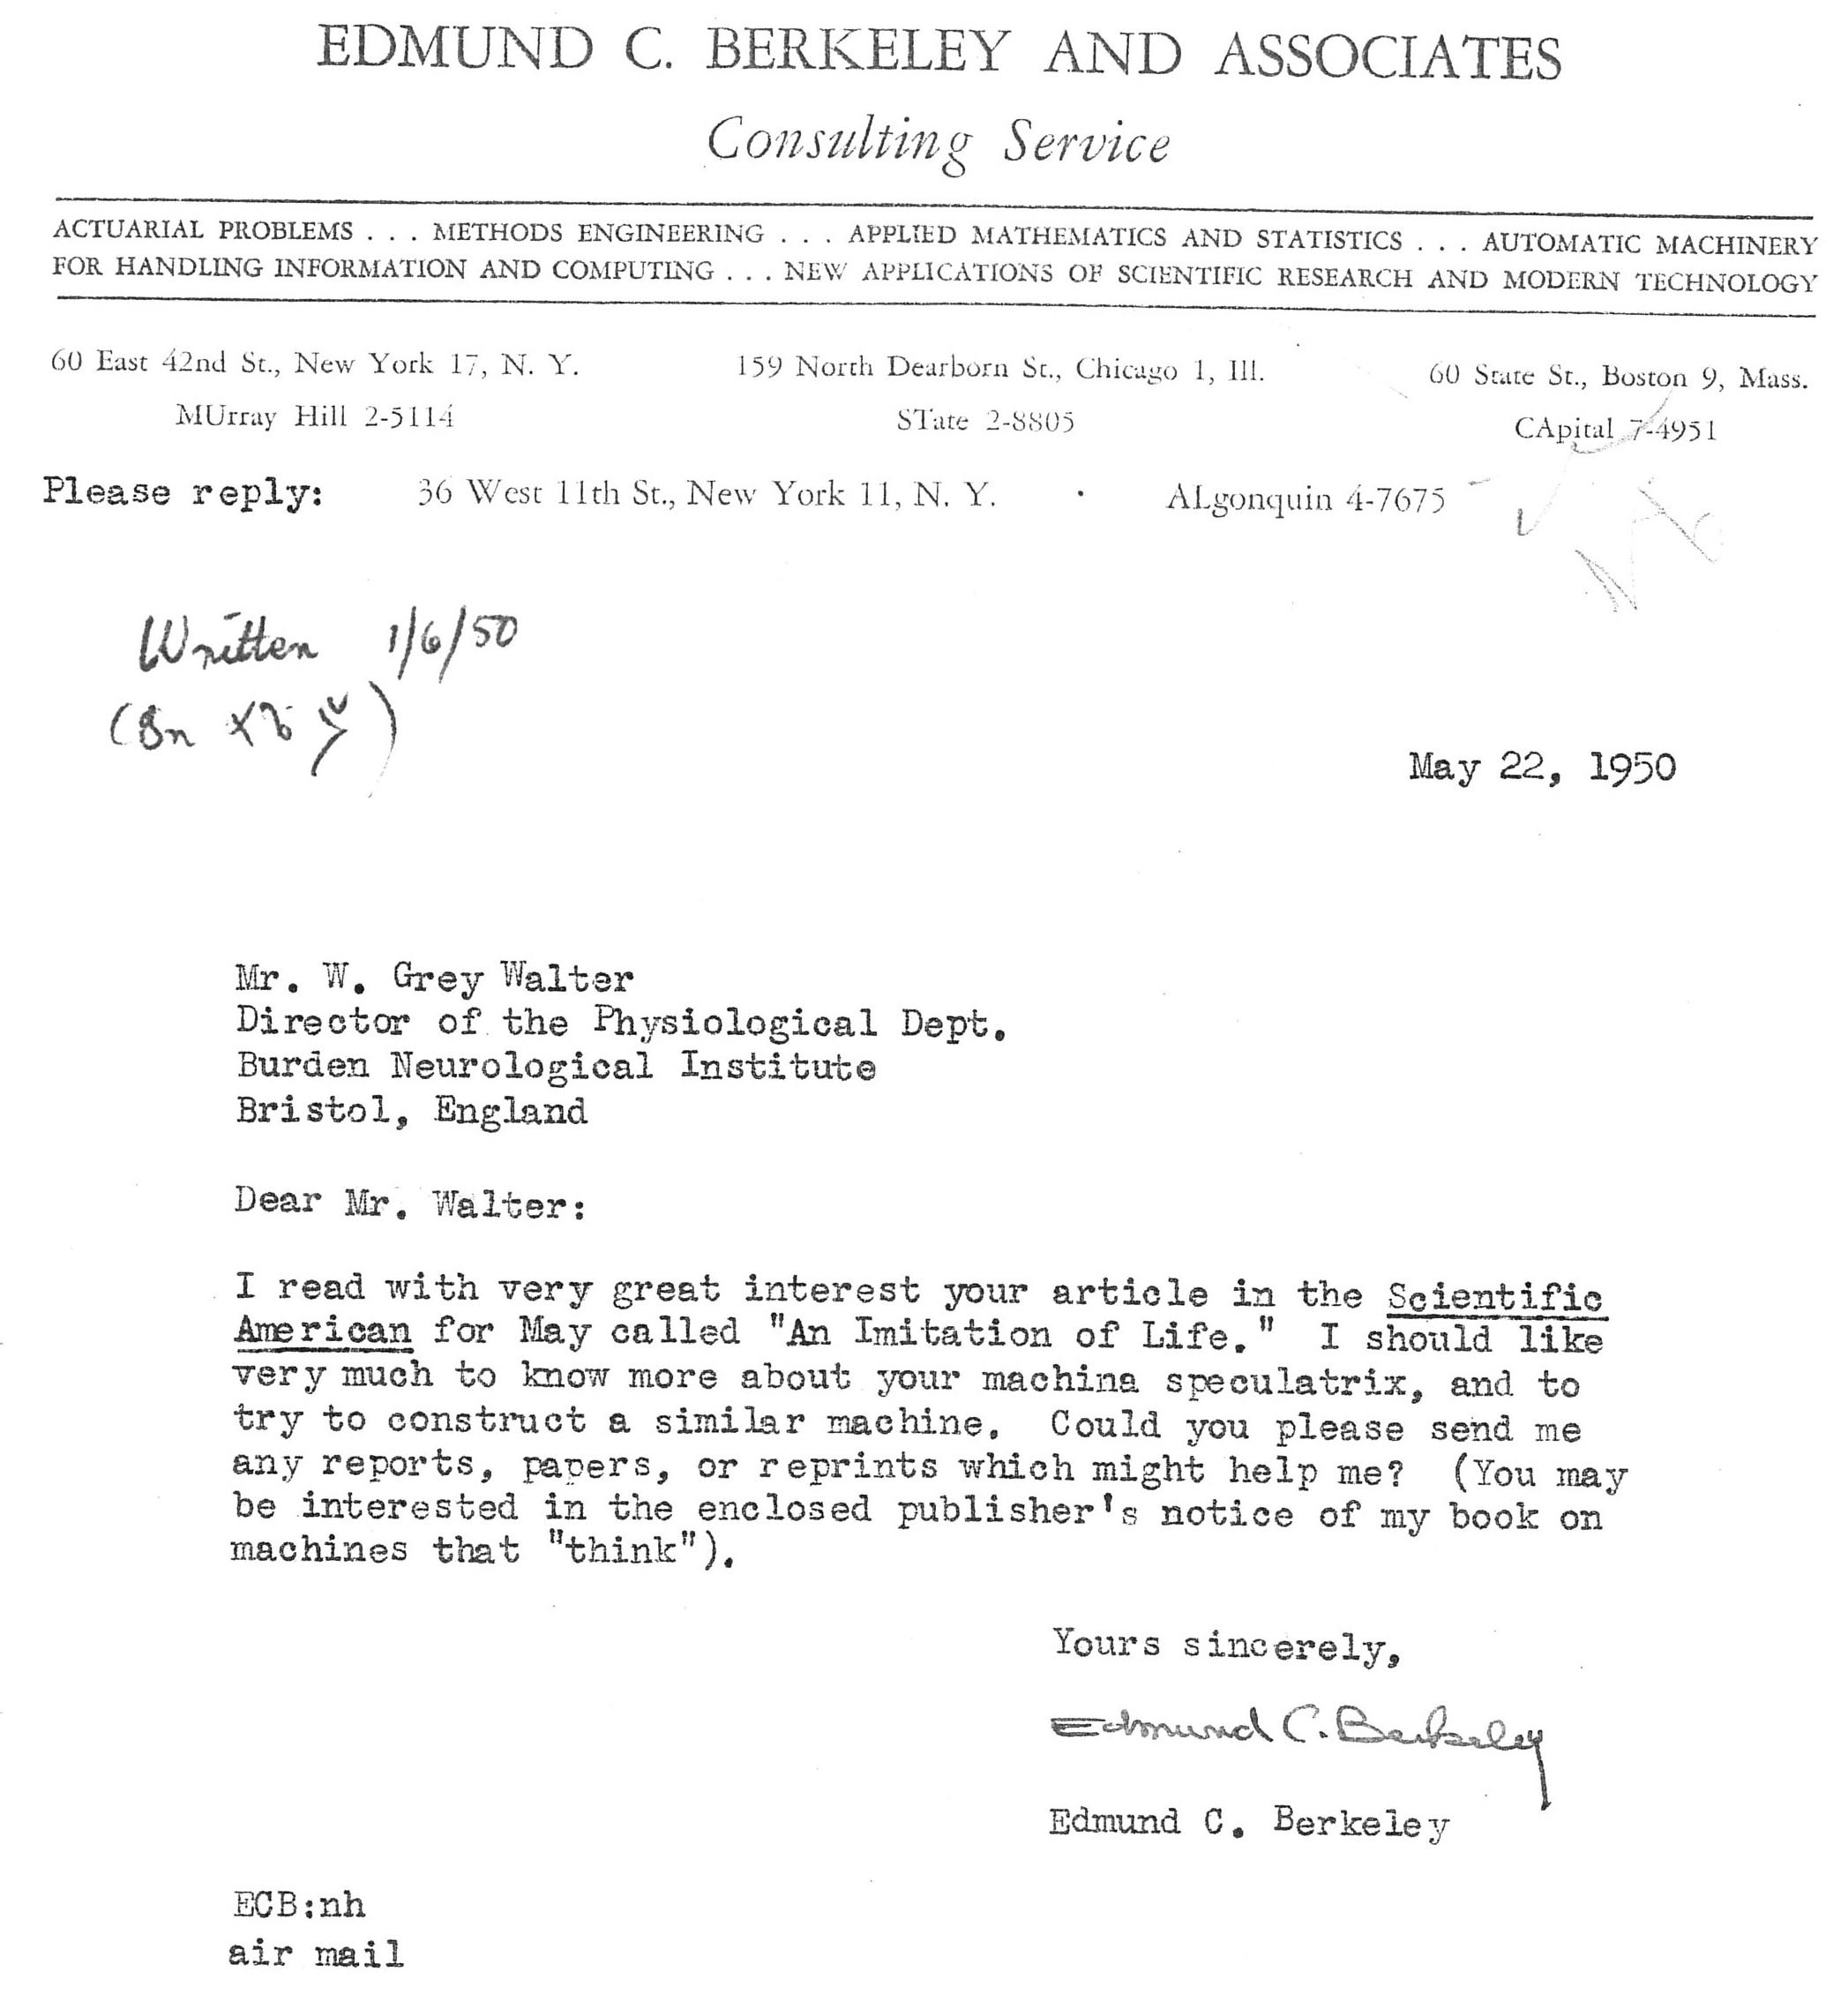 Письмо Эдмунда Беркли изобретателю робочерепах Уолтеру Грею